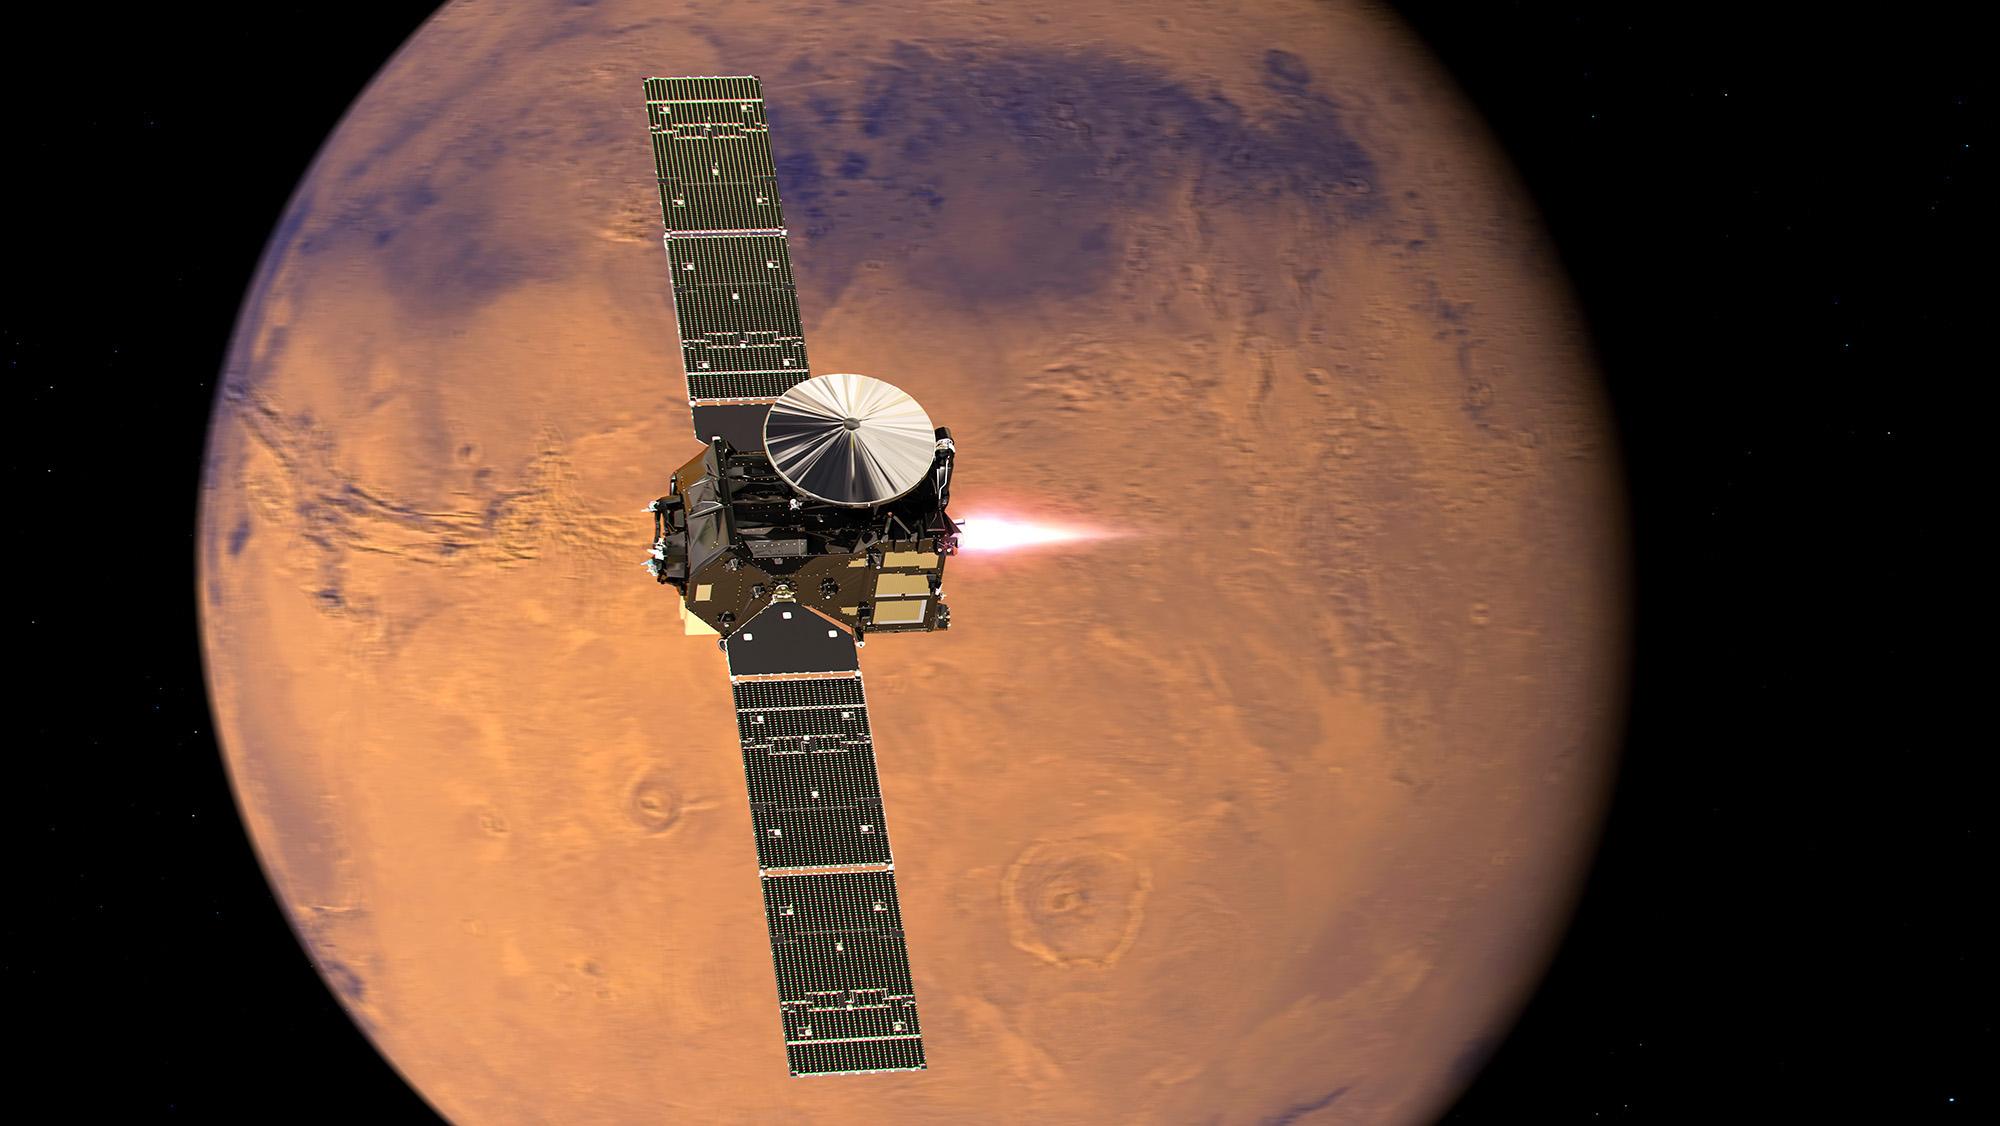 Artist's impression visualising the ExoMars 2016 Trace Gas Orbiter (TGO), with its thrusters firing, beginning its entry into Mars orbit on 19 October 2016. Credit: ESA/ATG medialab